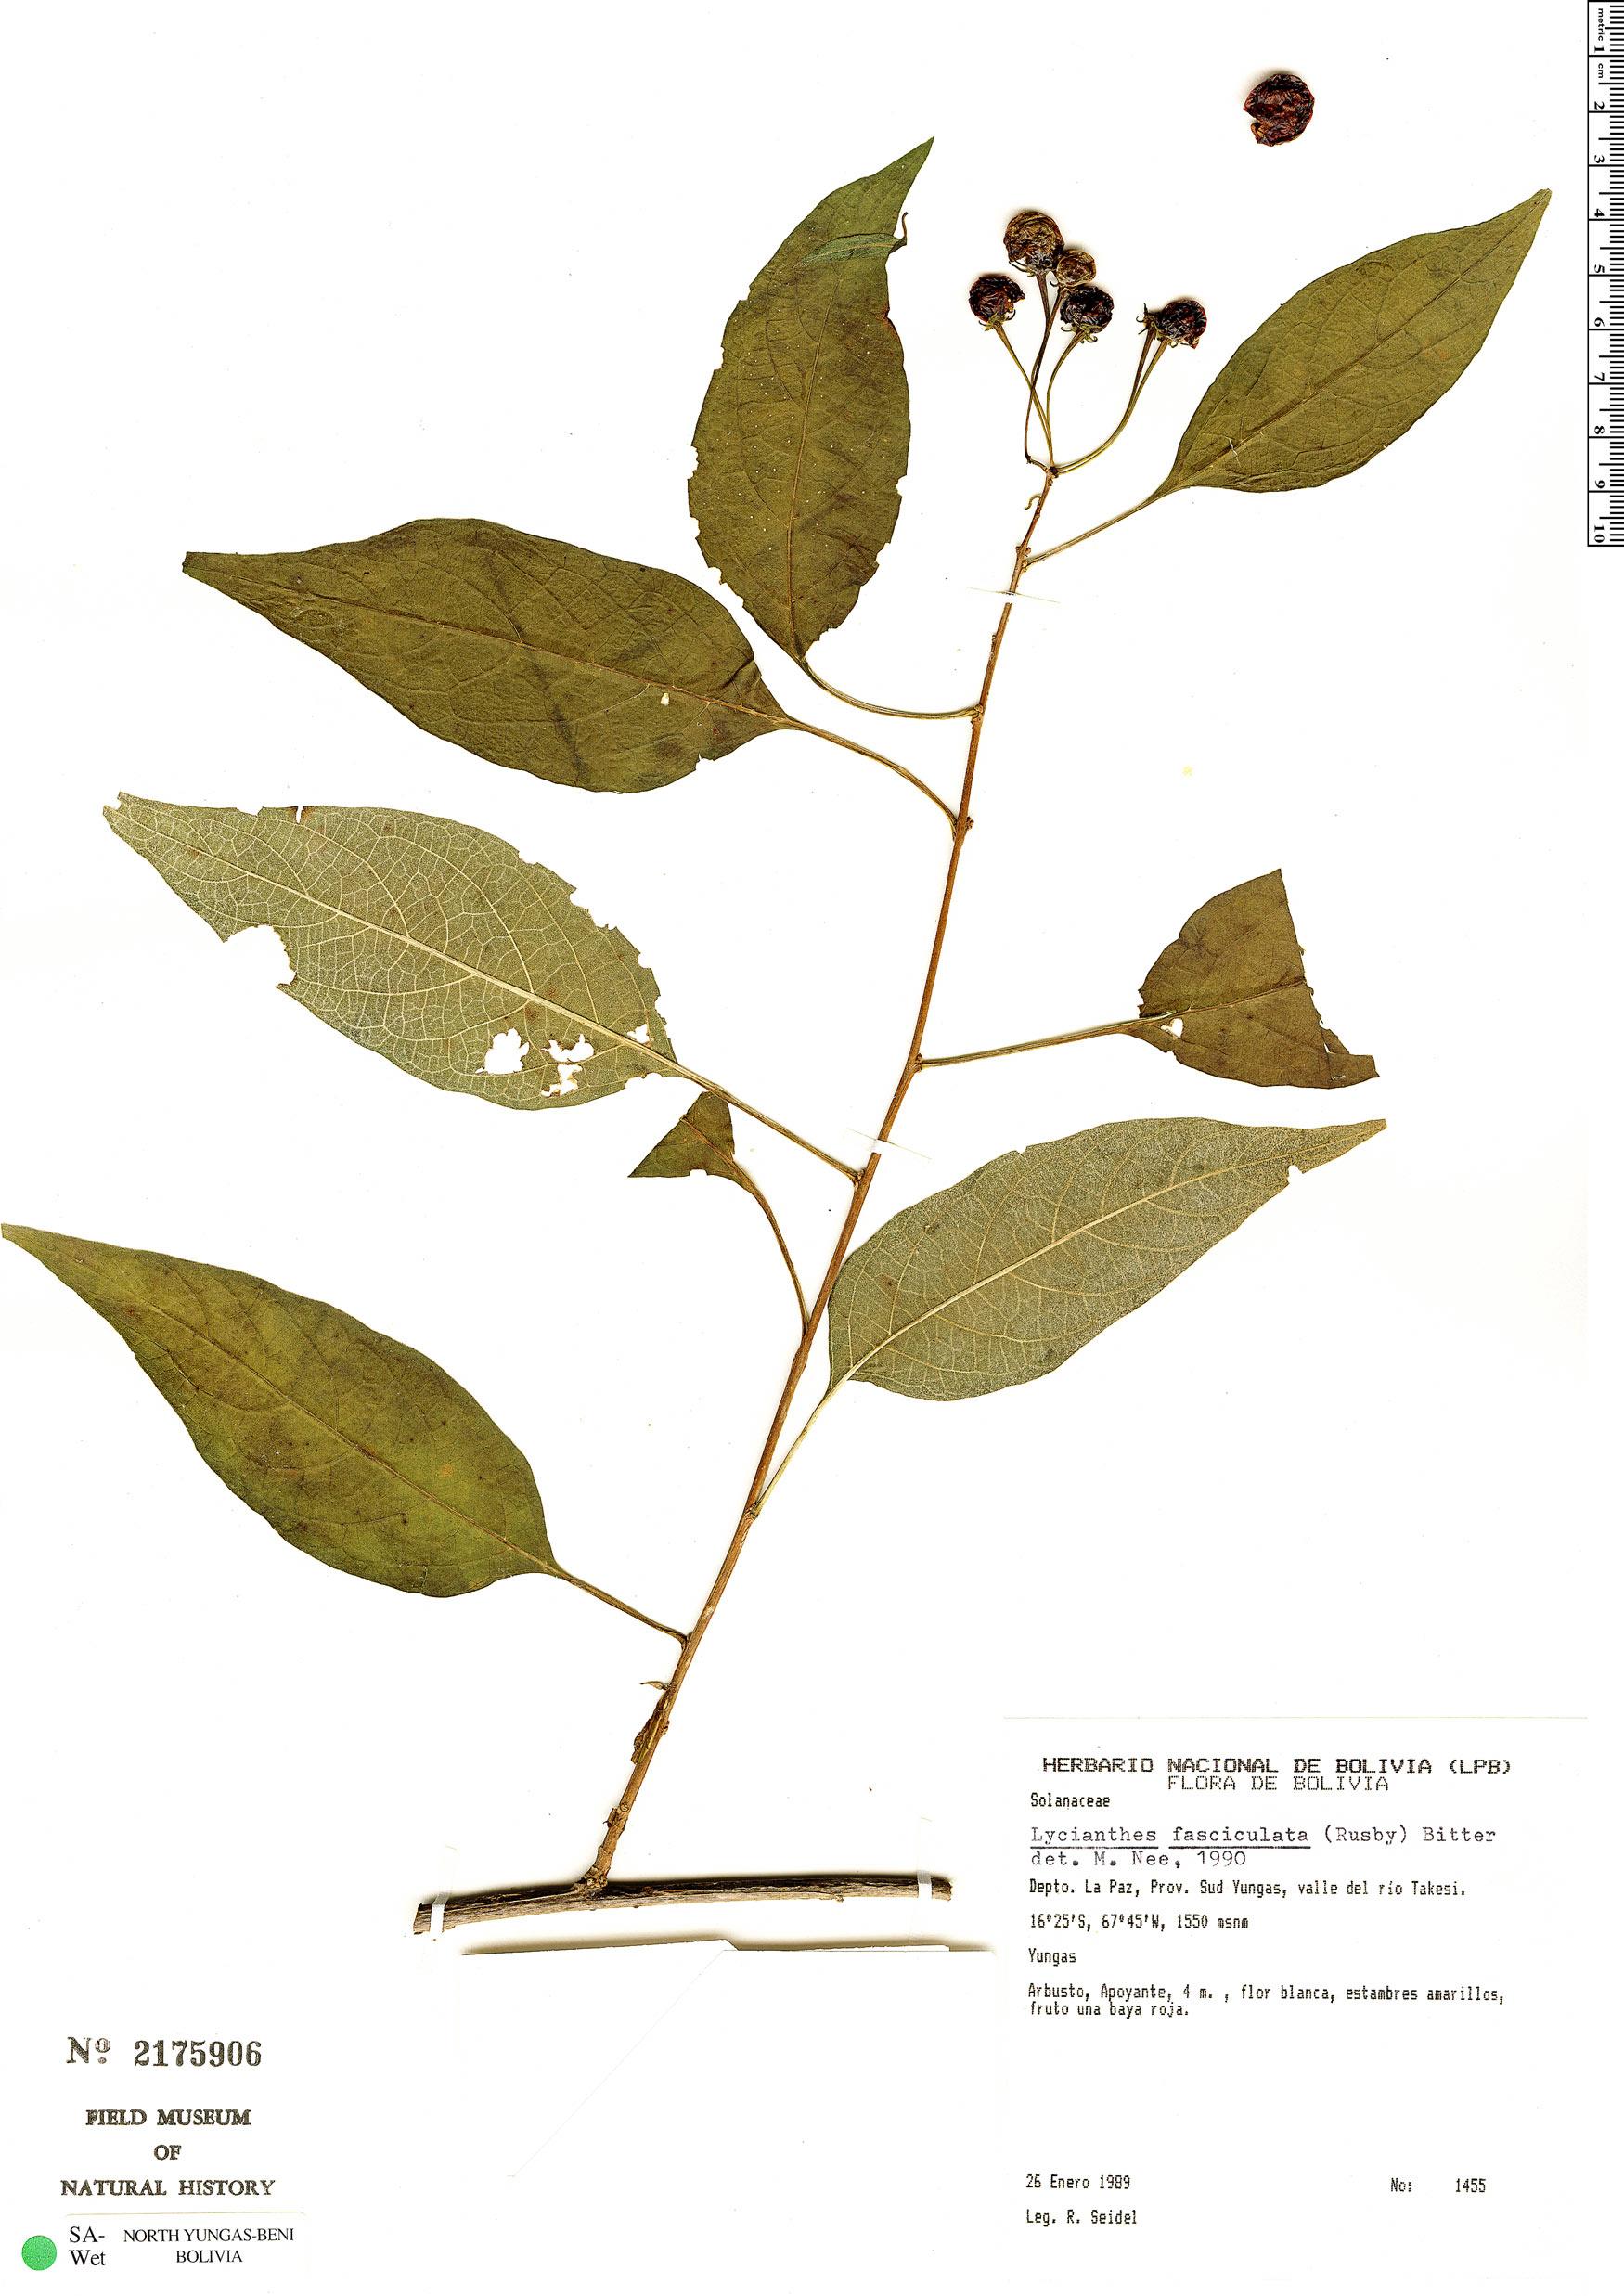 Specimen: Lycianthes fasciculata